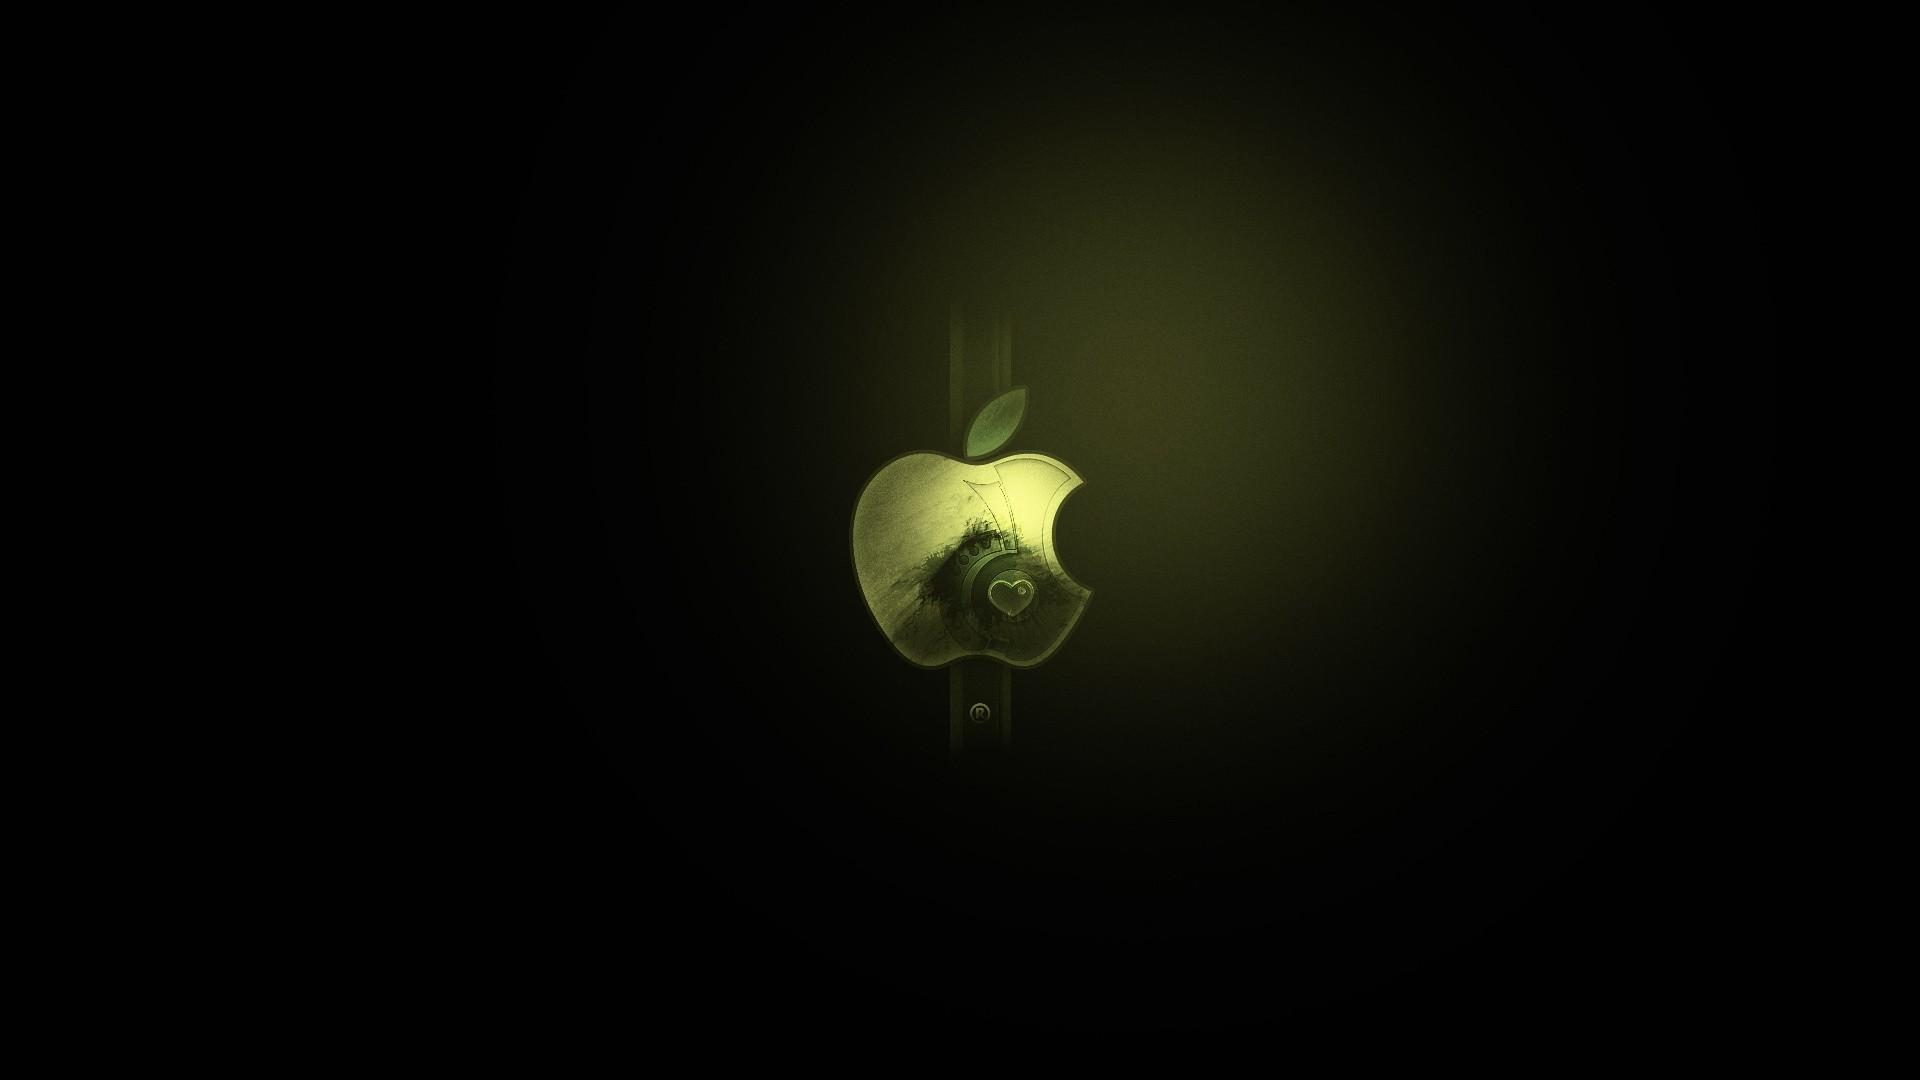 Wallpaper logo, black, white, apple, mac, minimalist